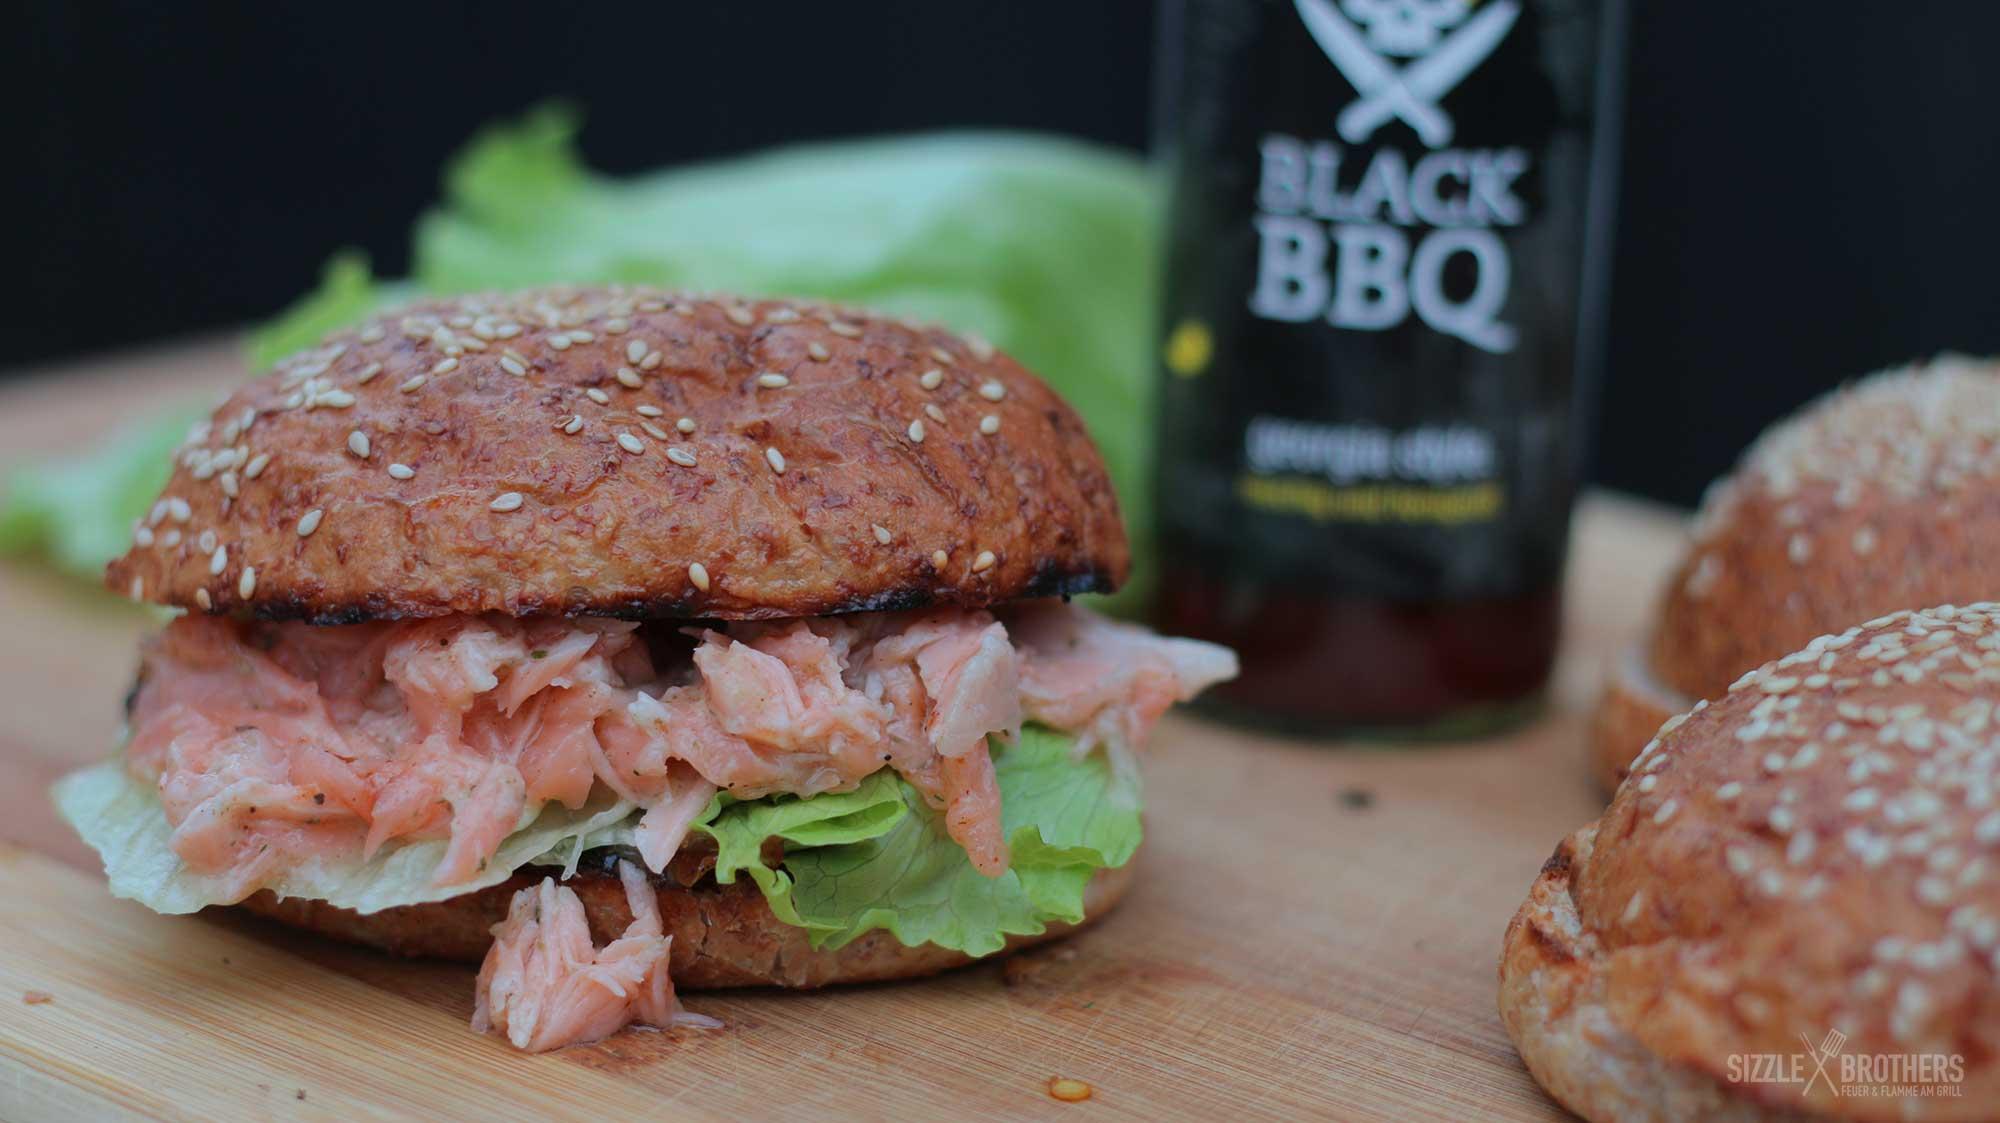 Pulled Pork Gasgrill Sizzle Brothers : Pulled lachs burger garen auf zedernholz mega lecker!